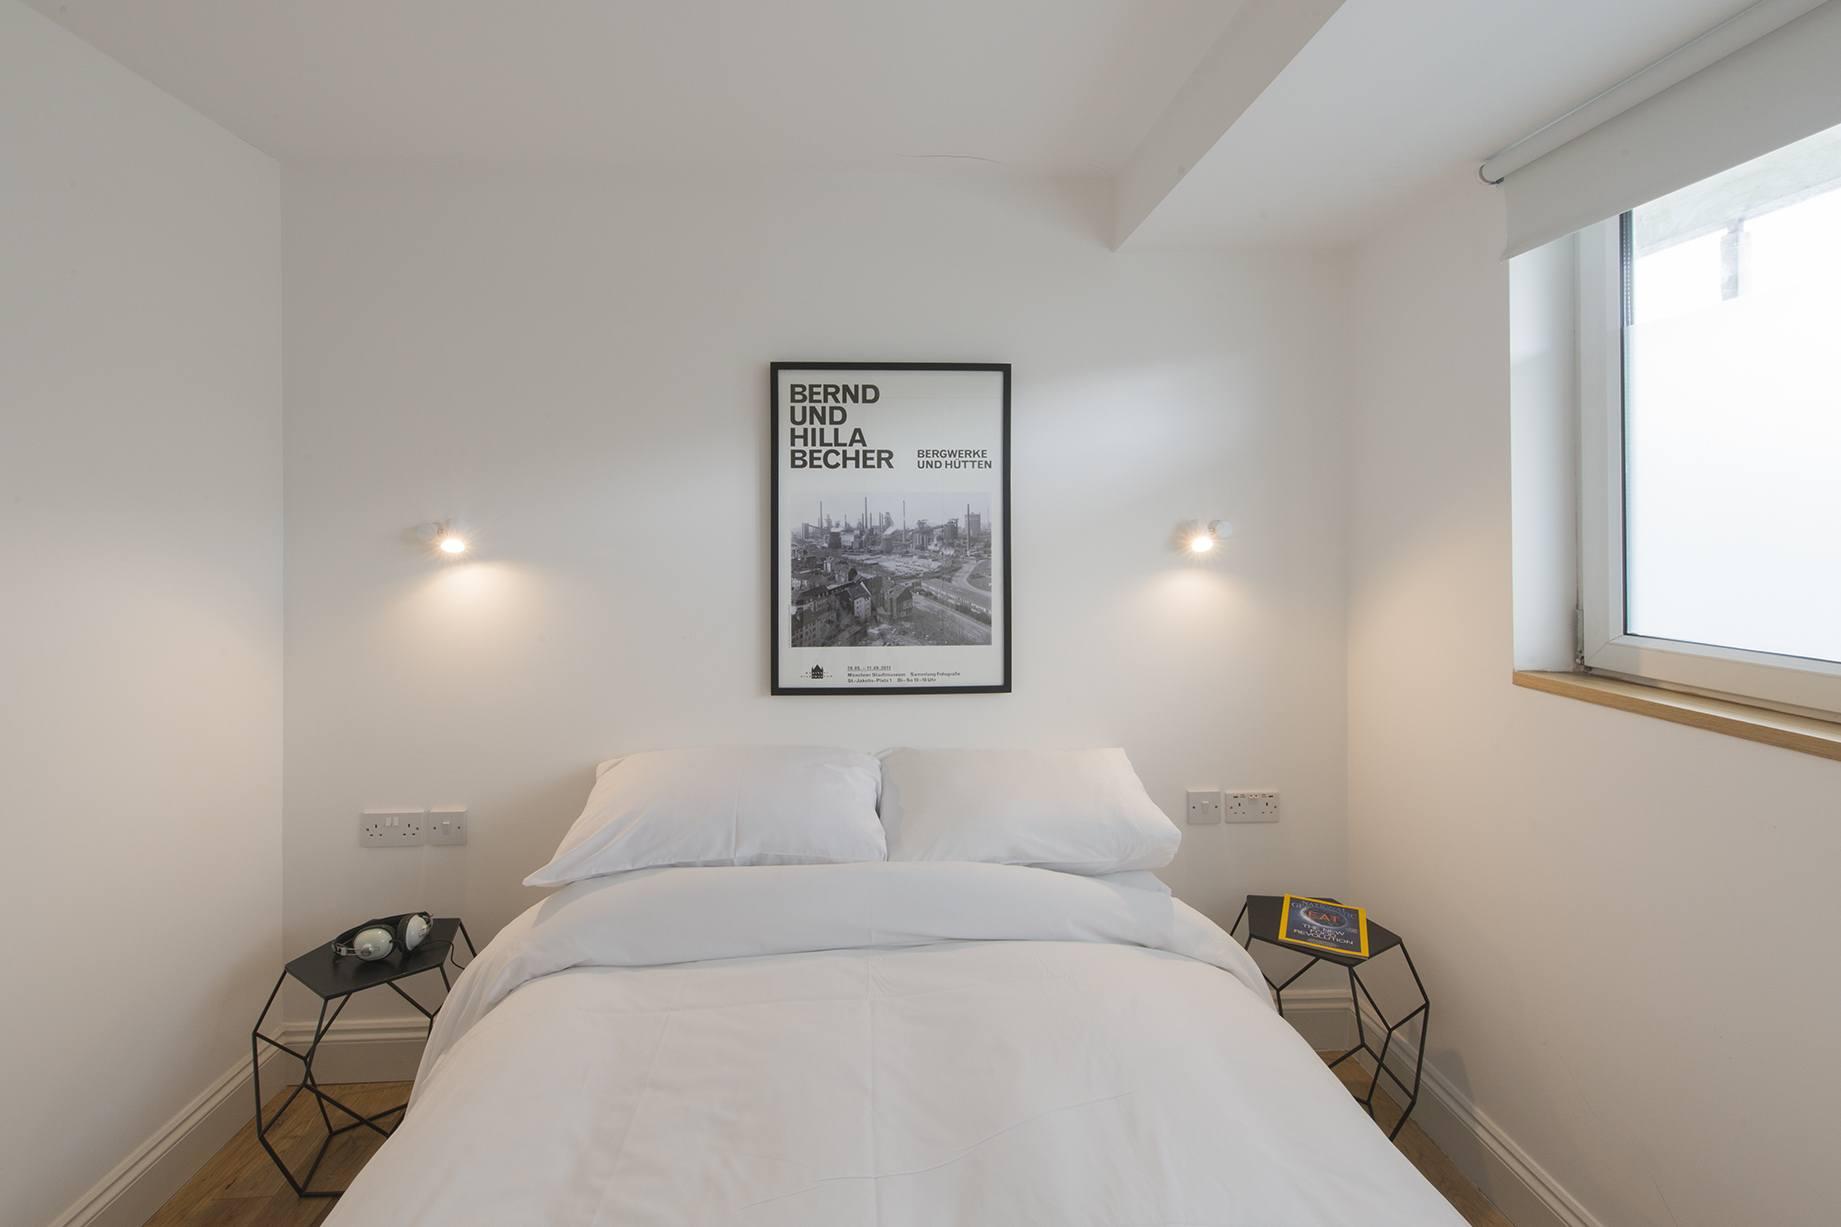 Bed001.jpg